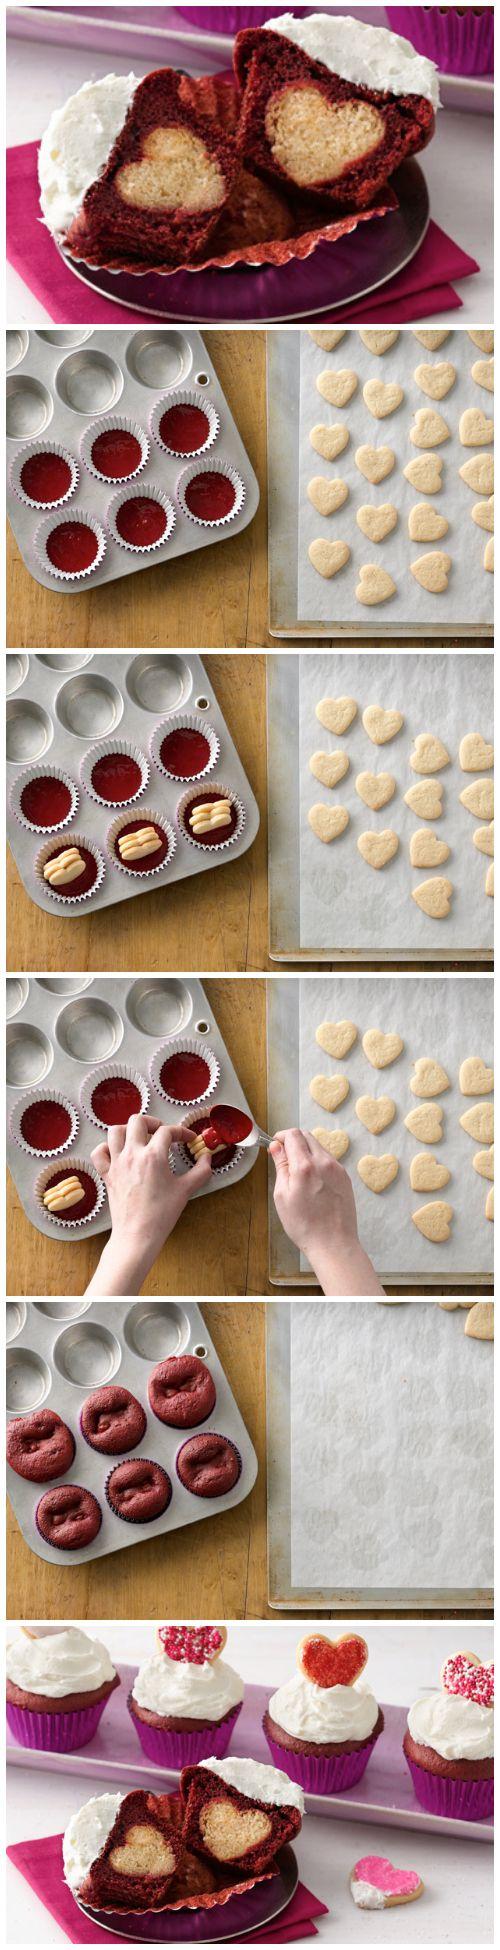 cupcake galleta